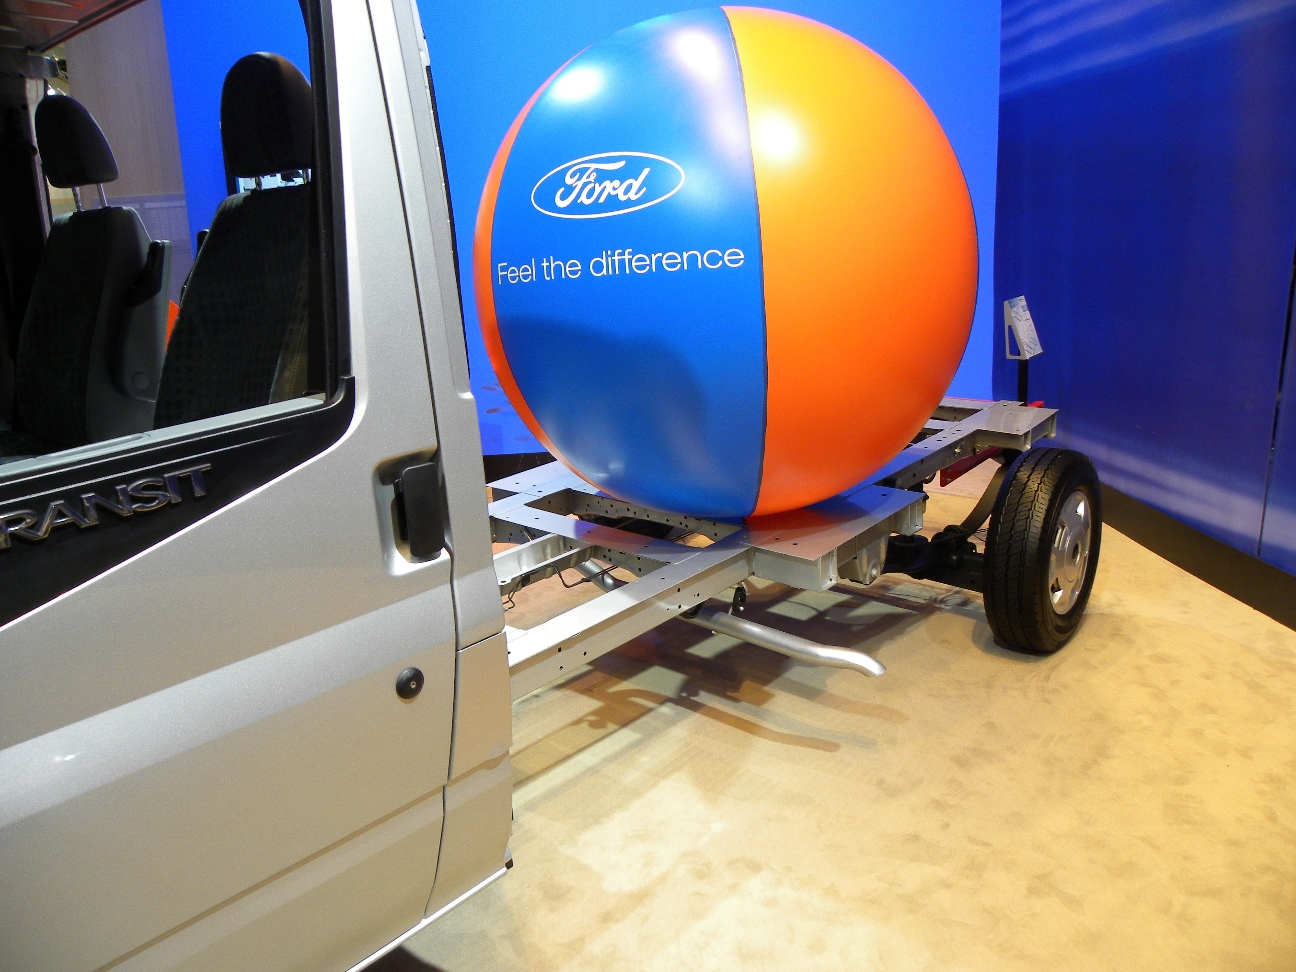 Caravan-Salon 2010: Ford mit Tiefrahmen-Fahrgestell - Auto ...